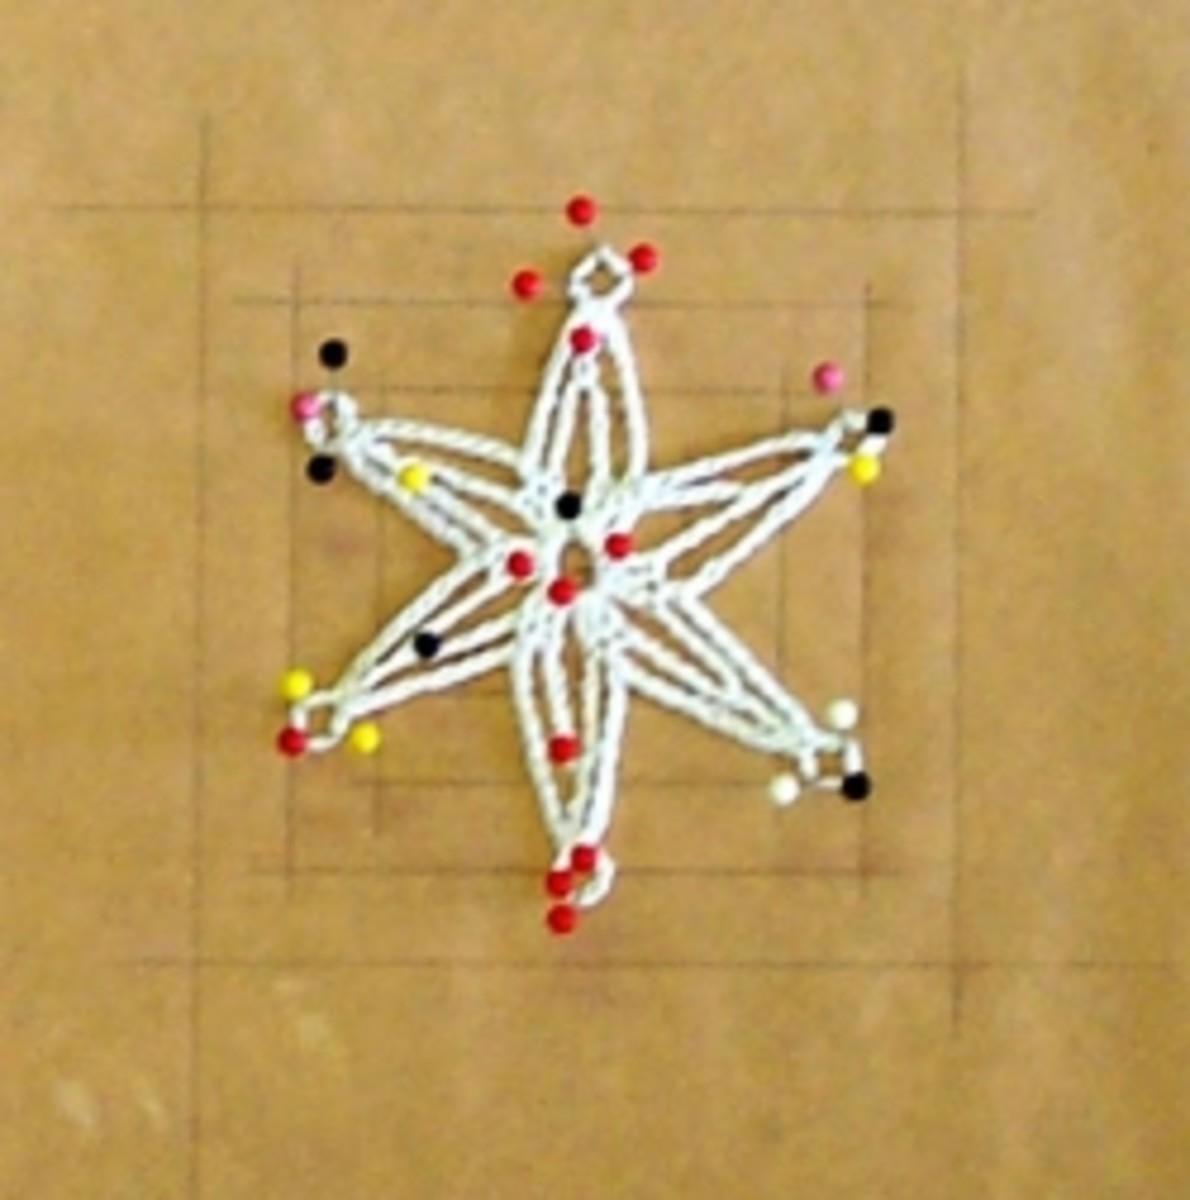 Blockign Crochet Snowflake Ornament - Photo by Mona Majorowicz